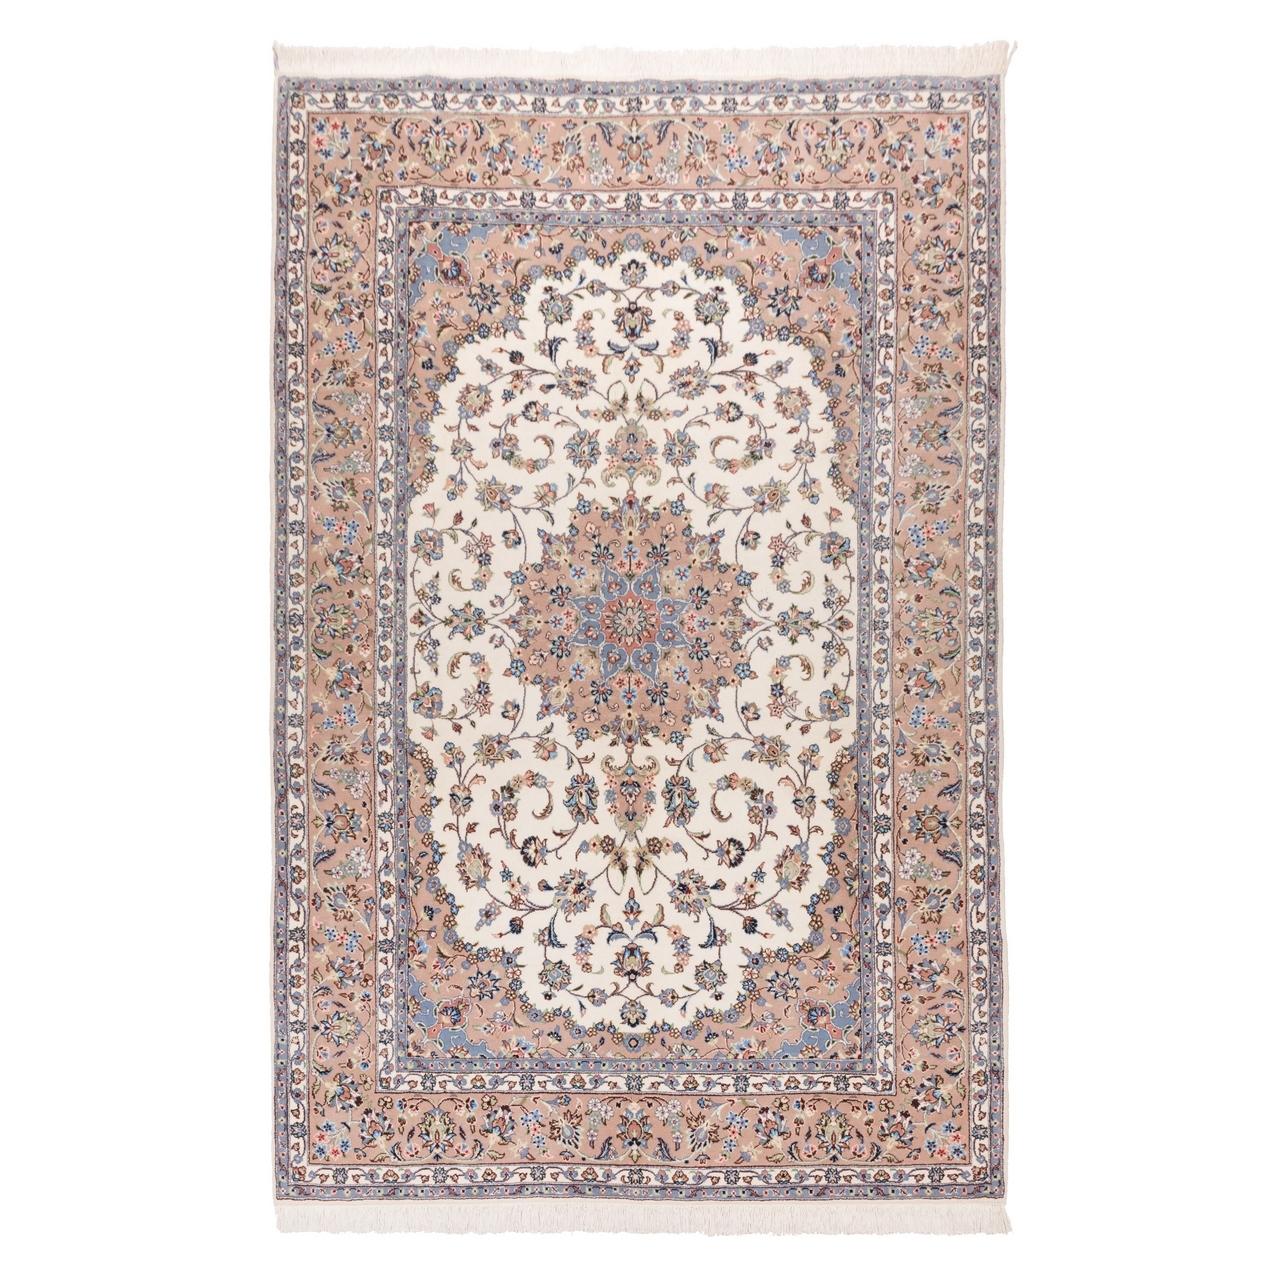 فرش دستباف شش متری سی پرشیا کد 174137